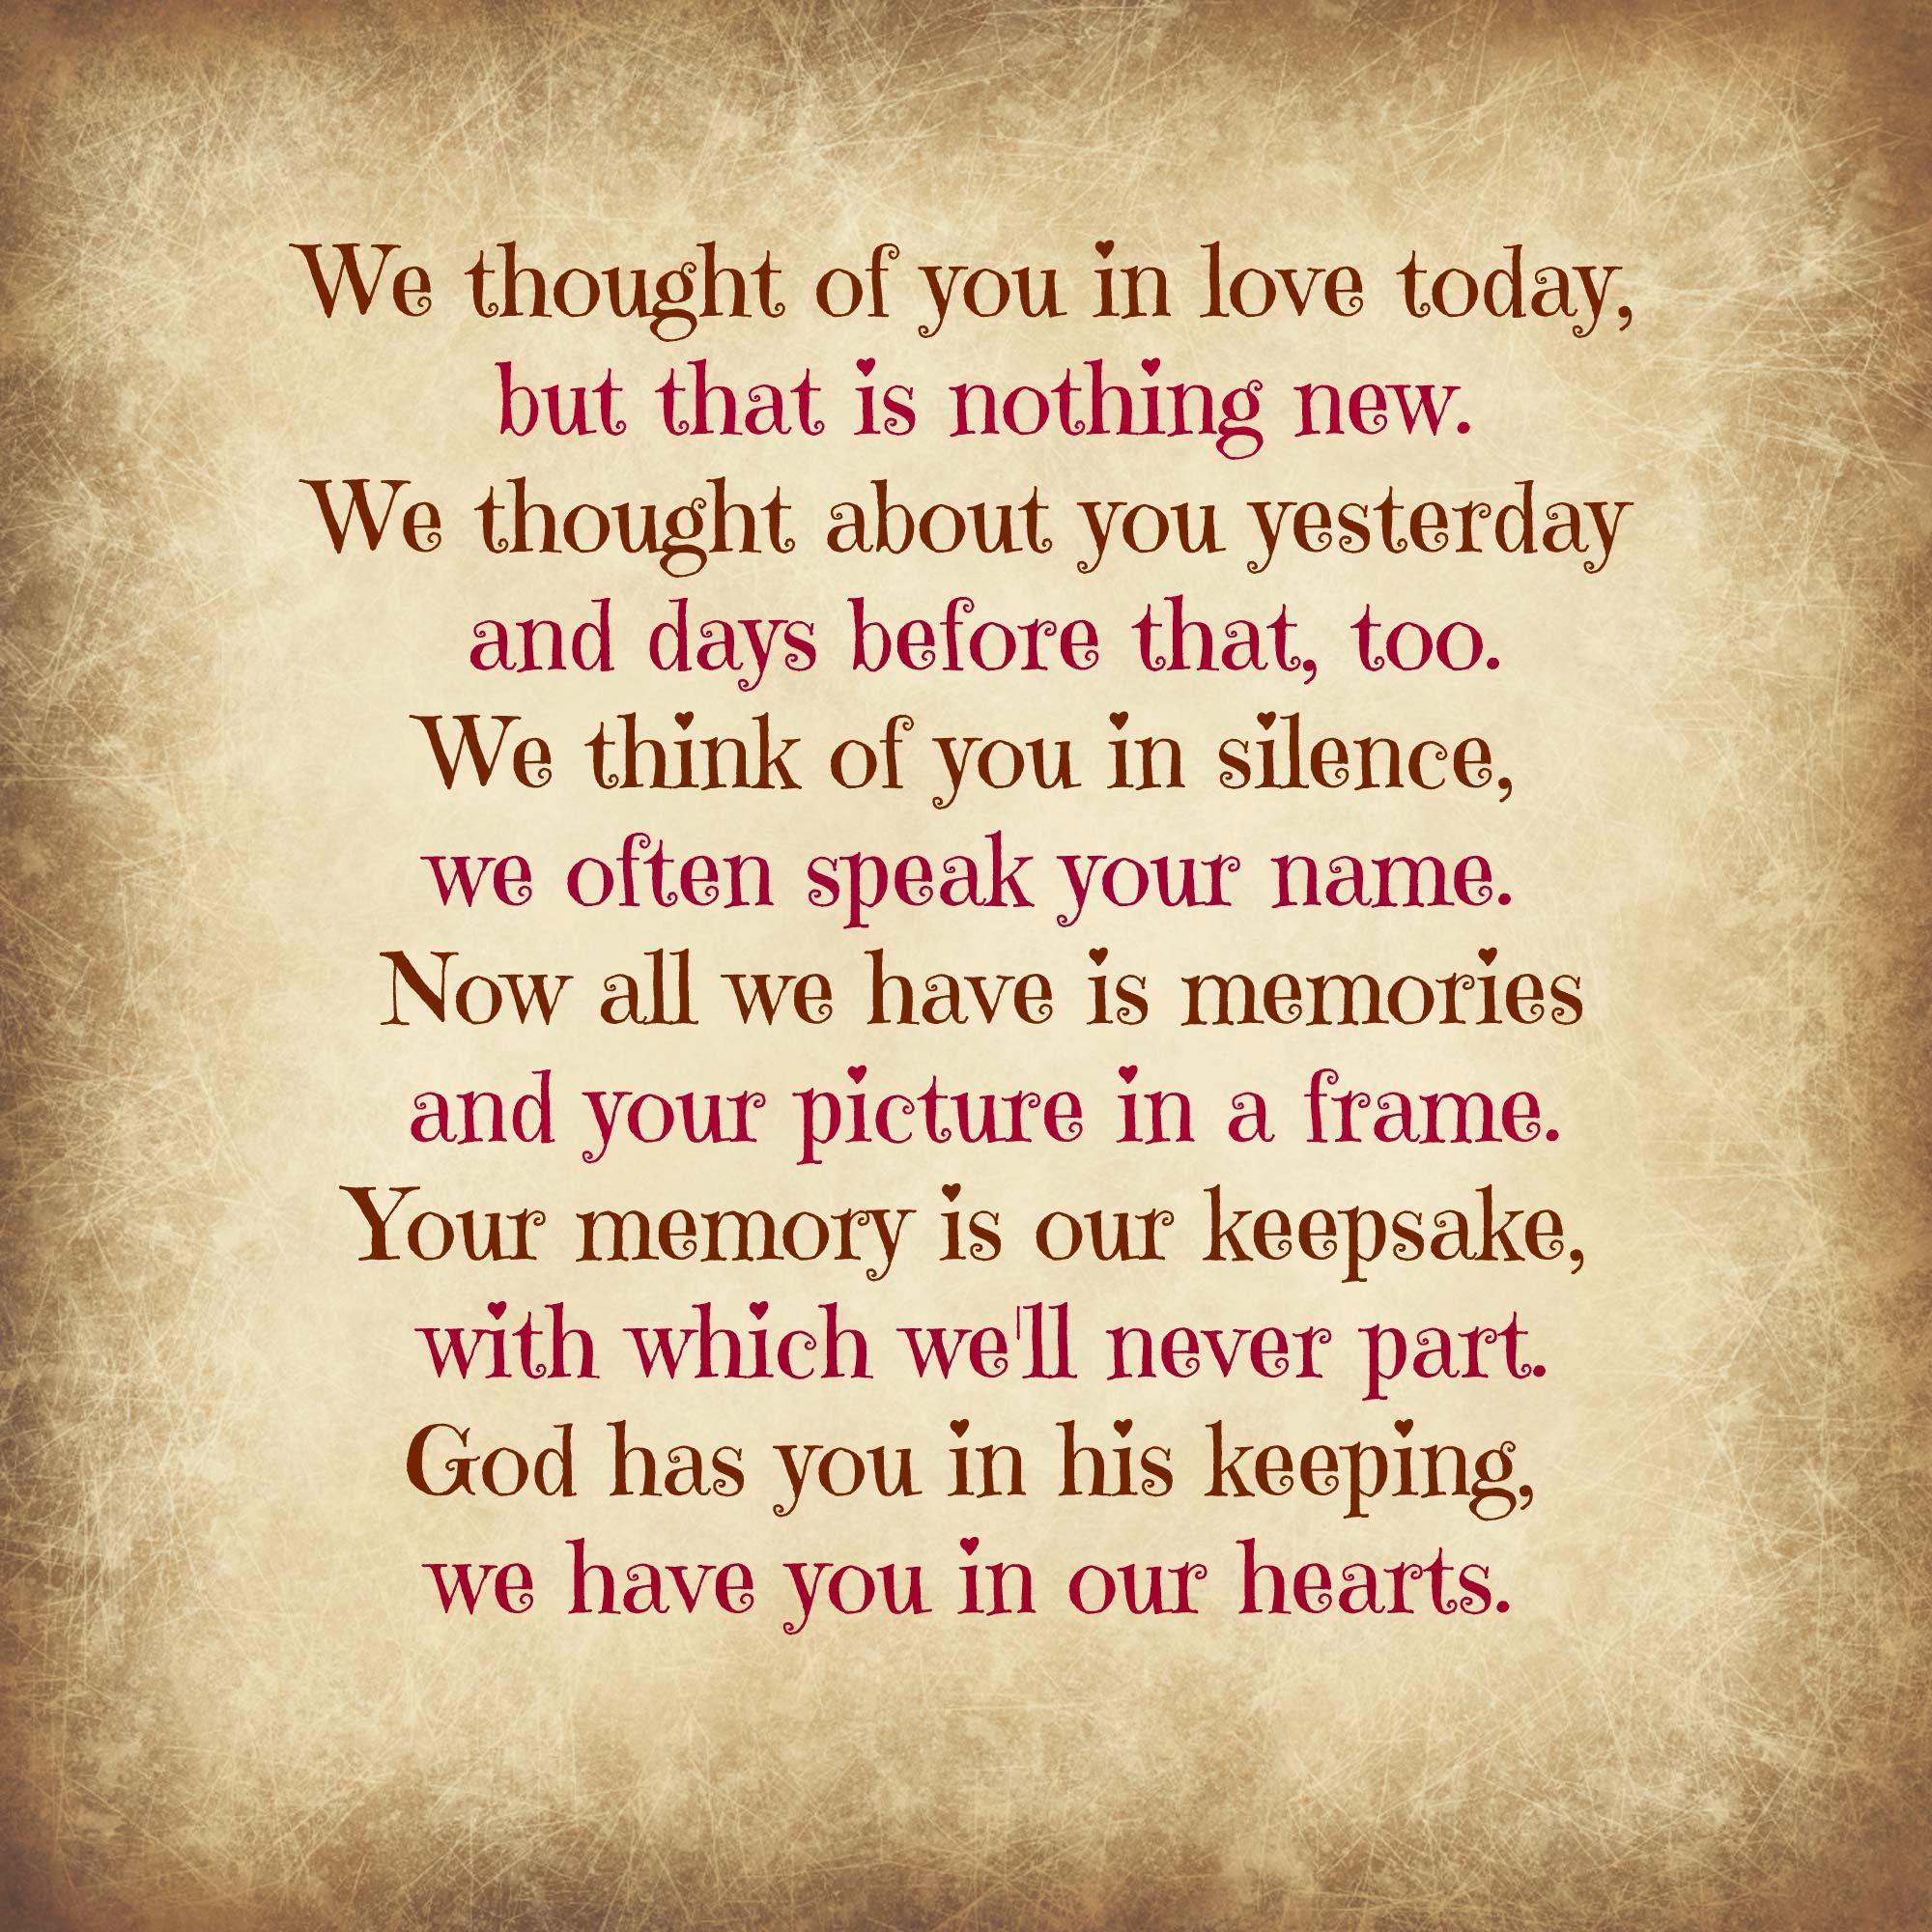 Memorial Day Bible Quotes: Memorial Bible Quotes. QuotesGram